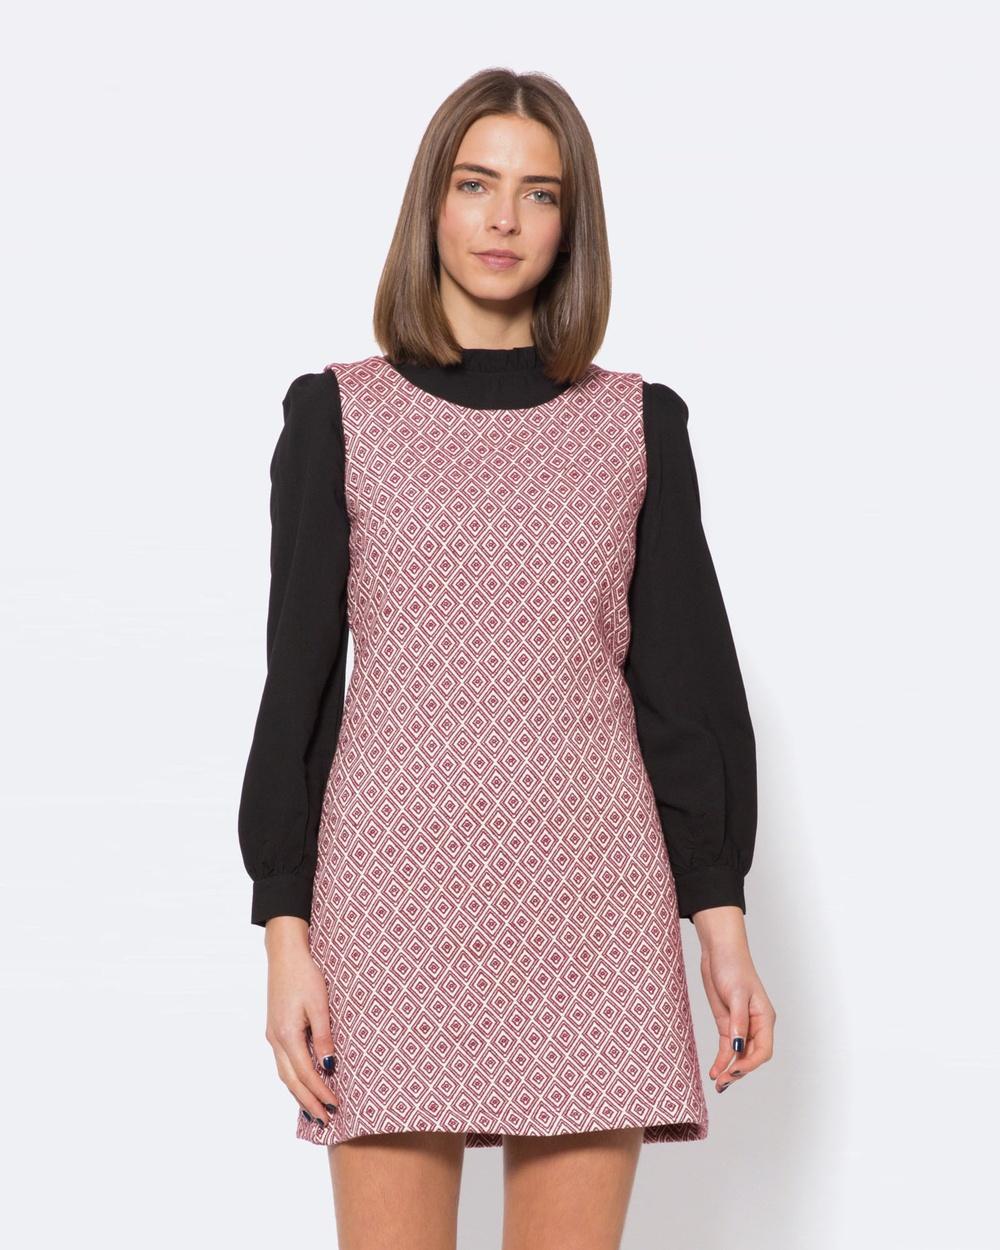 Princess Highway Maxine Jacquard Dress Dresses Pink Maxine Jacquard Dress